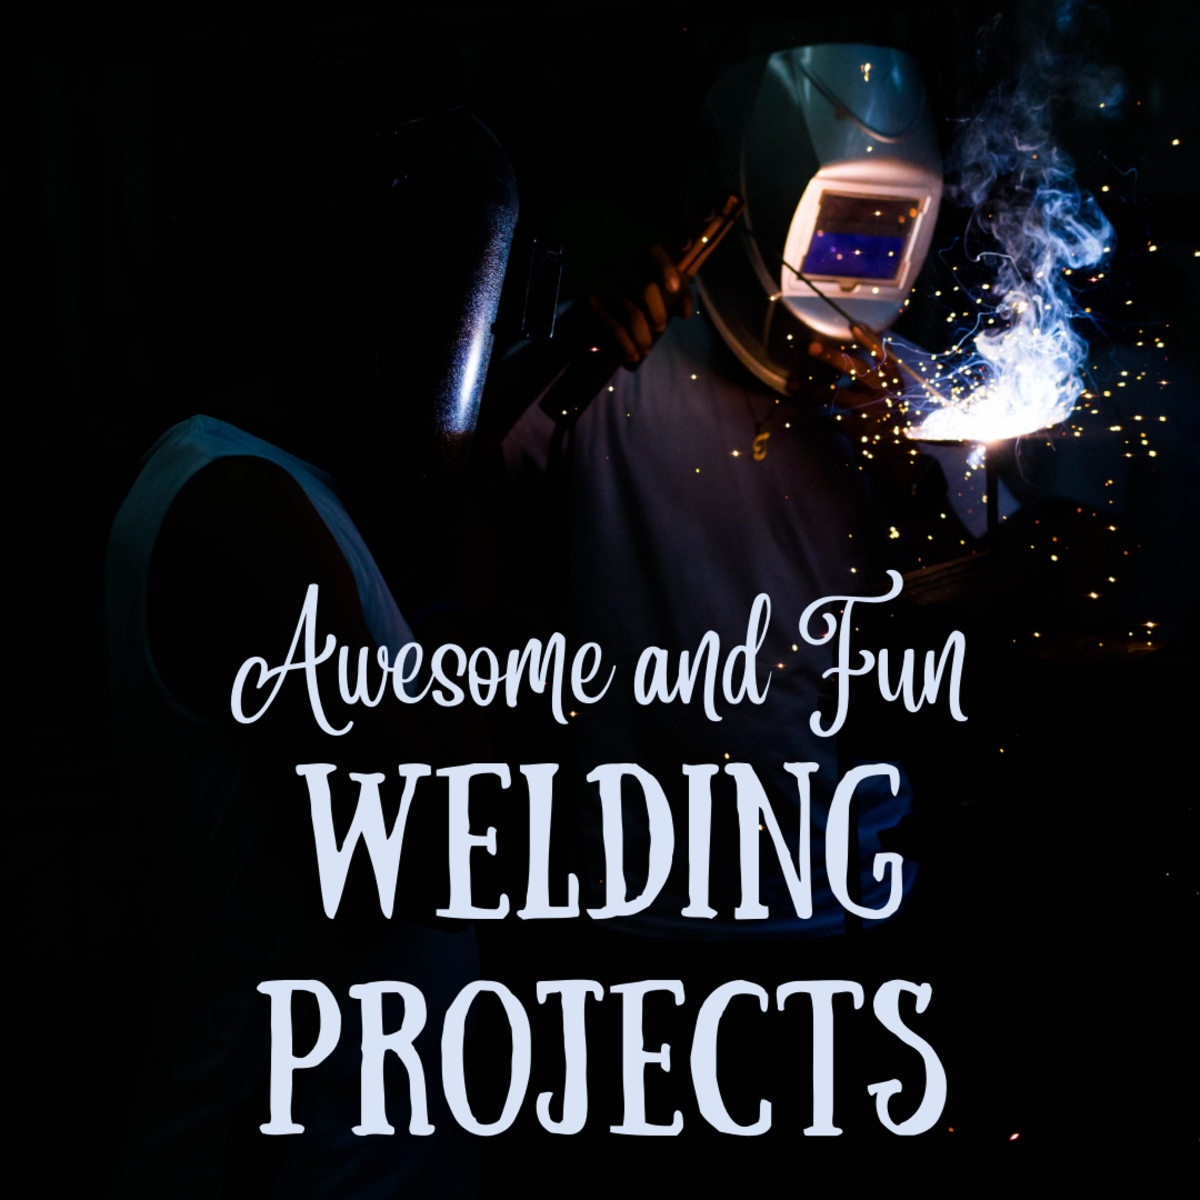 Fun welding projects for beginner and intermediate welders!